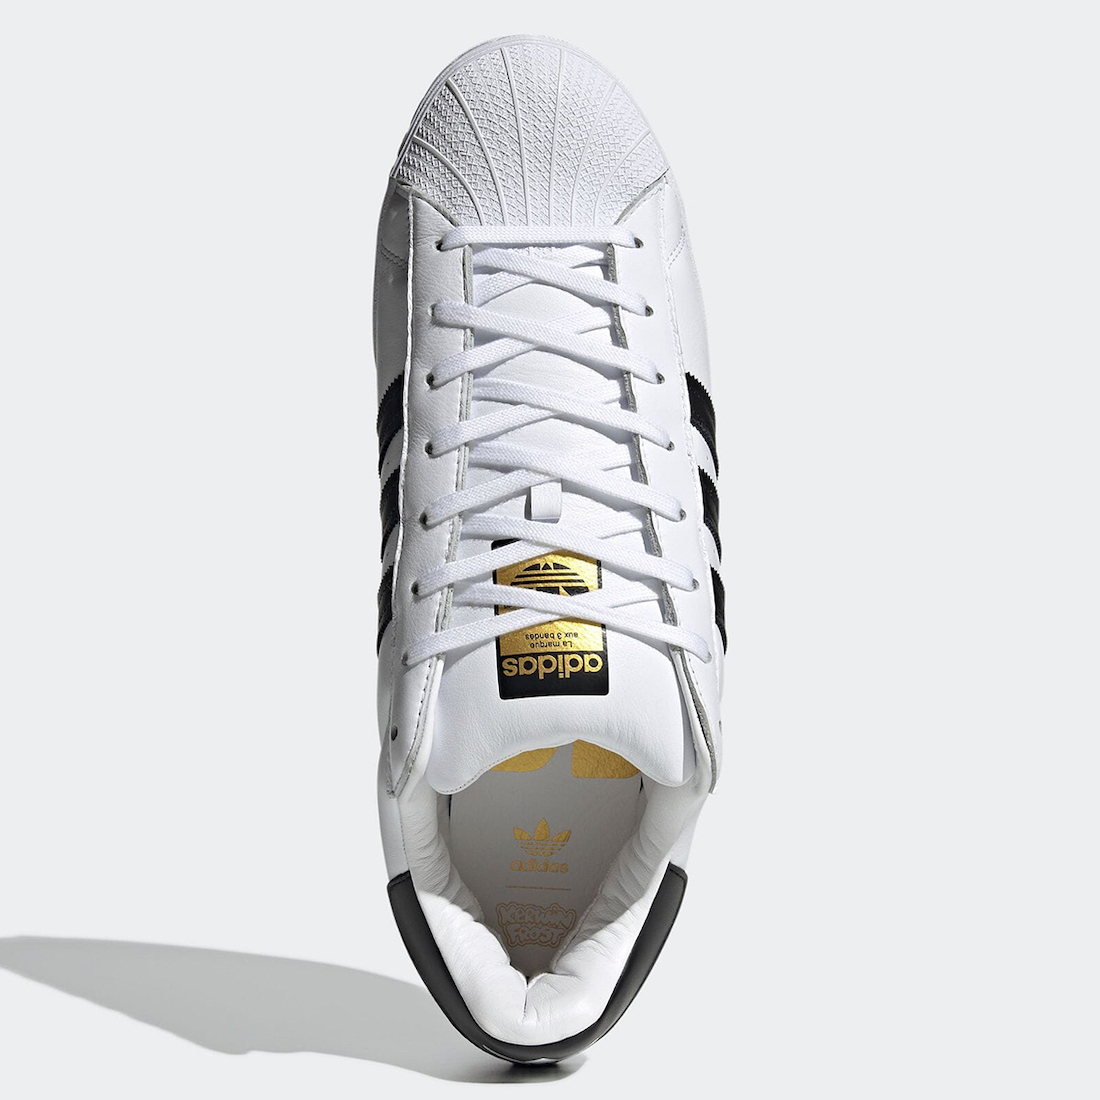 Kerwin Frost adidas Superstar Superstuffed GY5167 Release Date Info